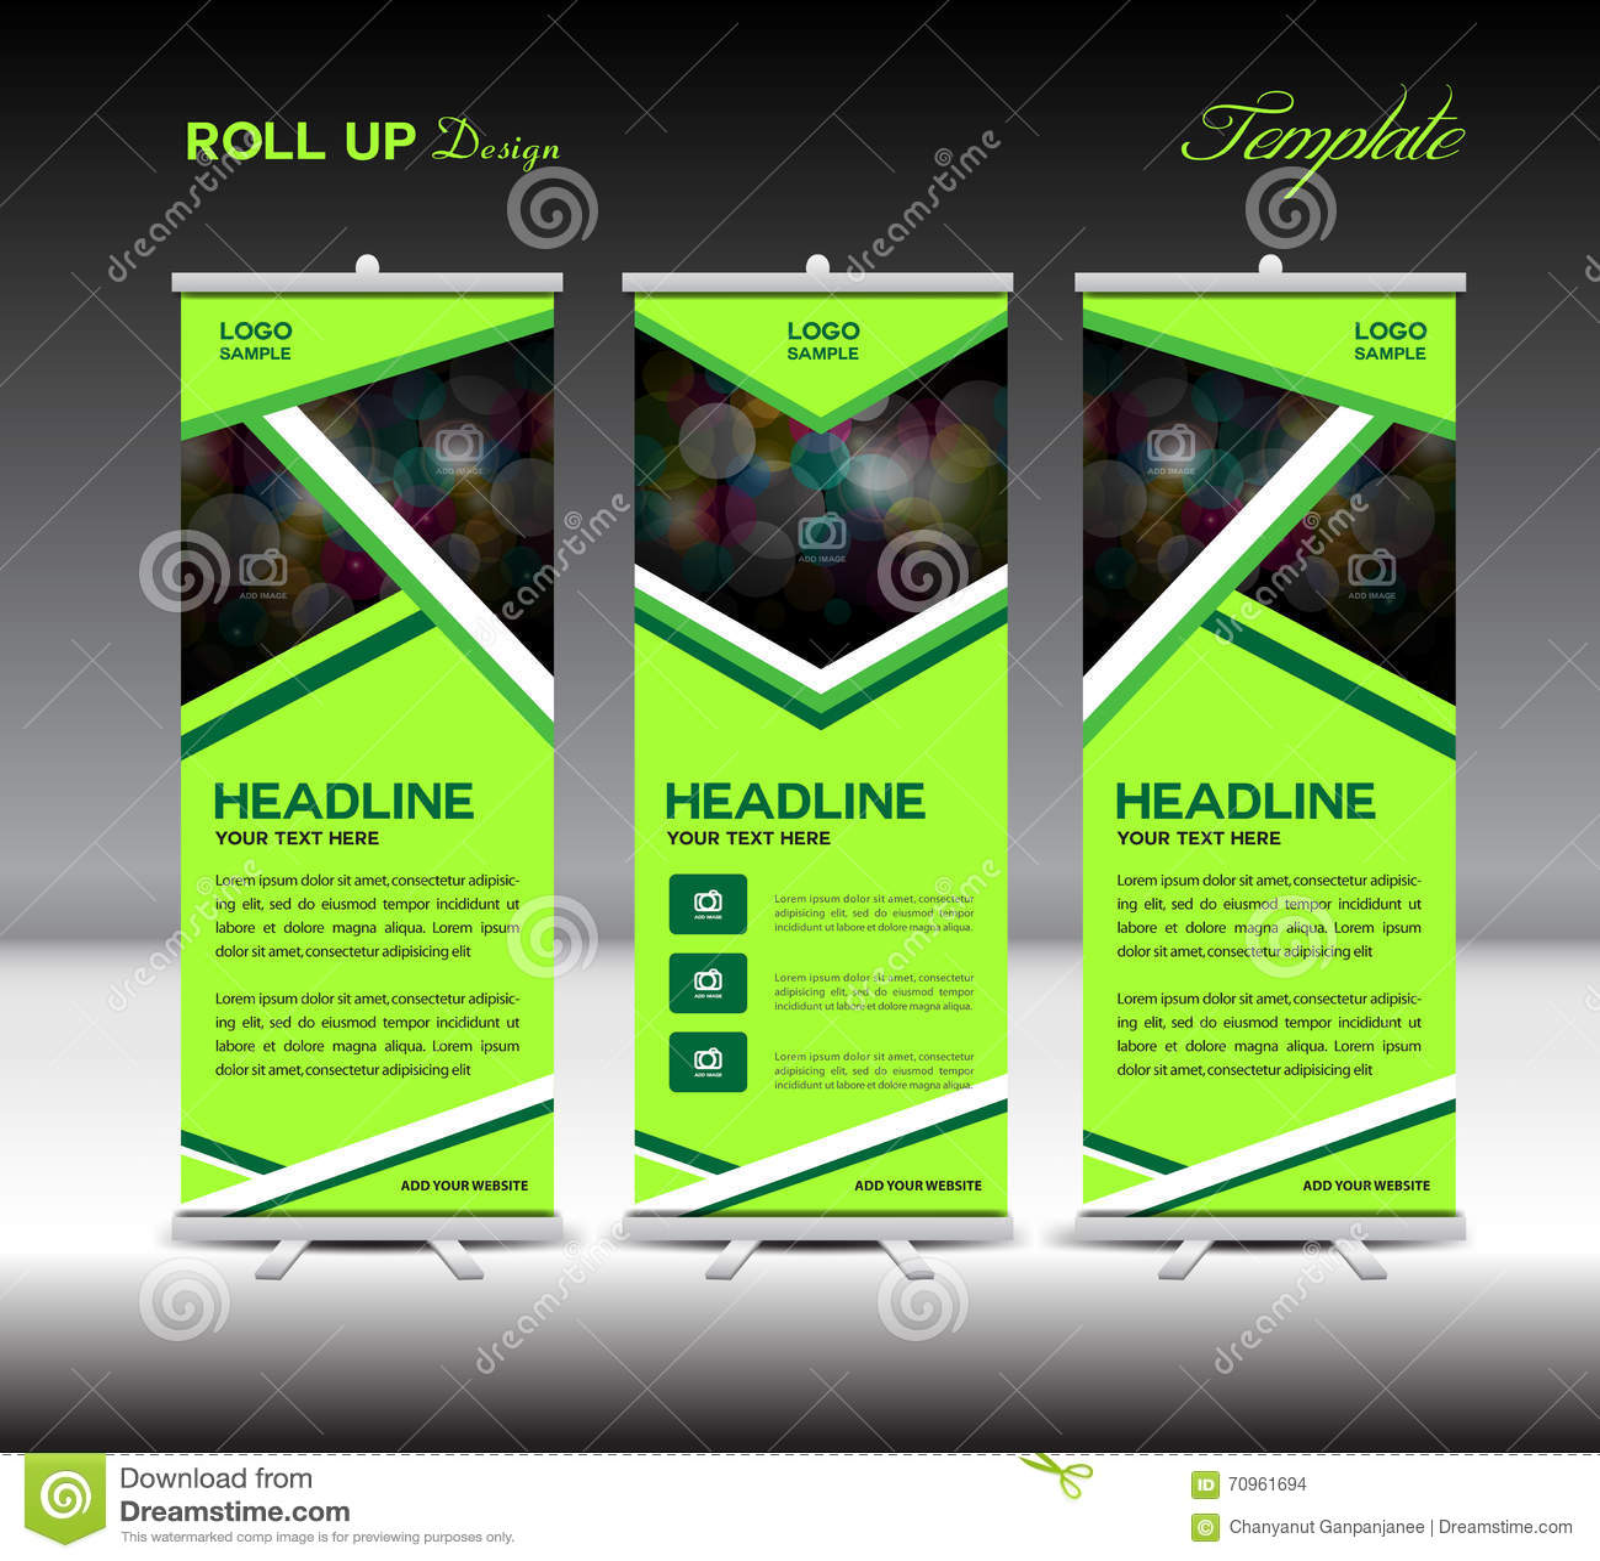 Design banner template - Royalty Free Vector Download Green Roll Up Banner Template Stand Template Design